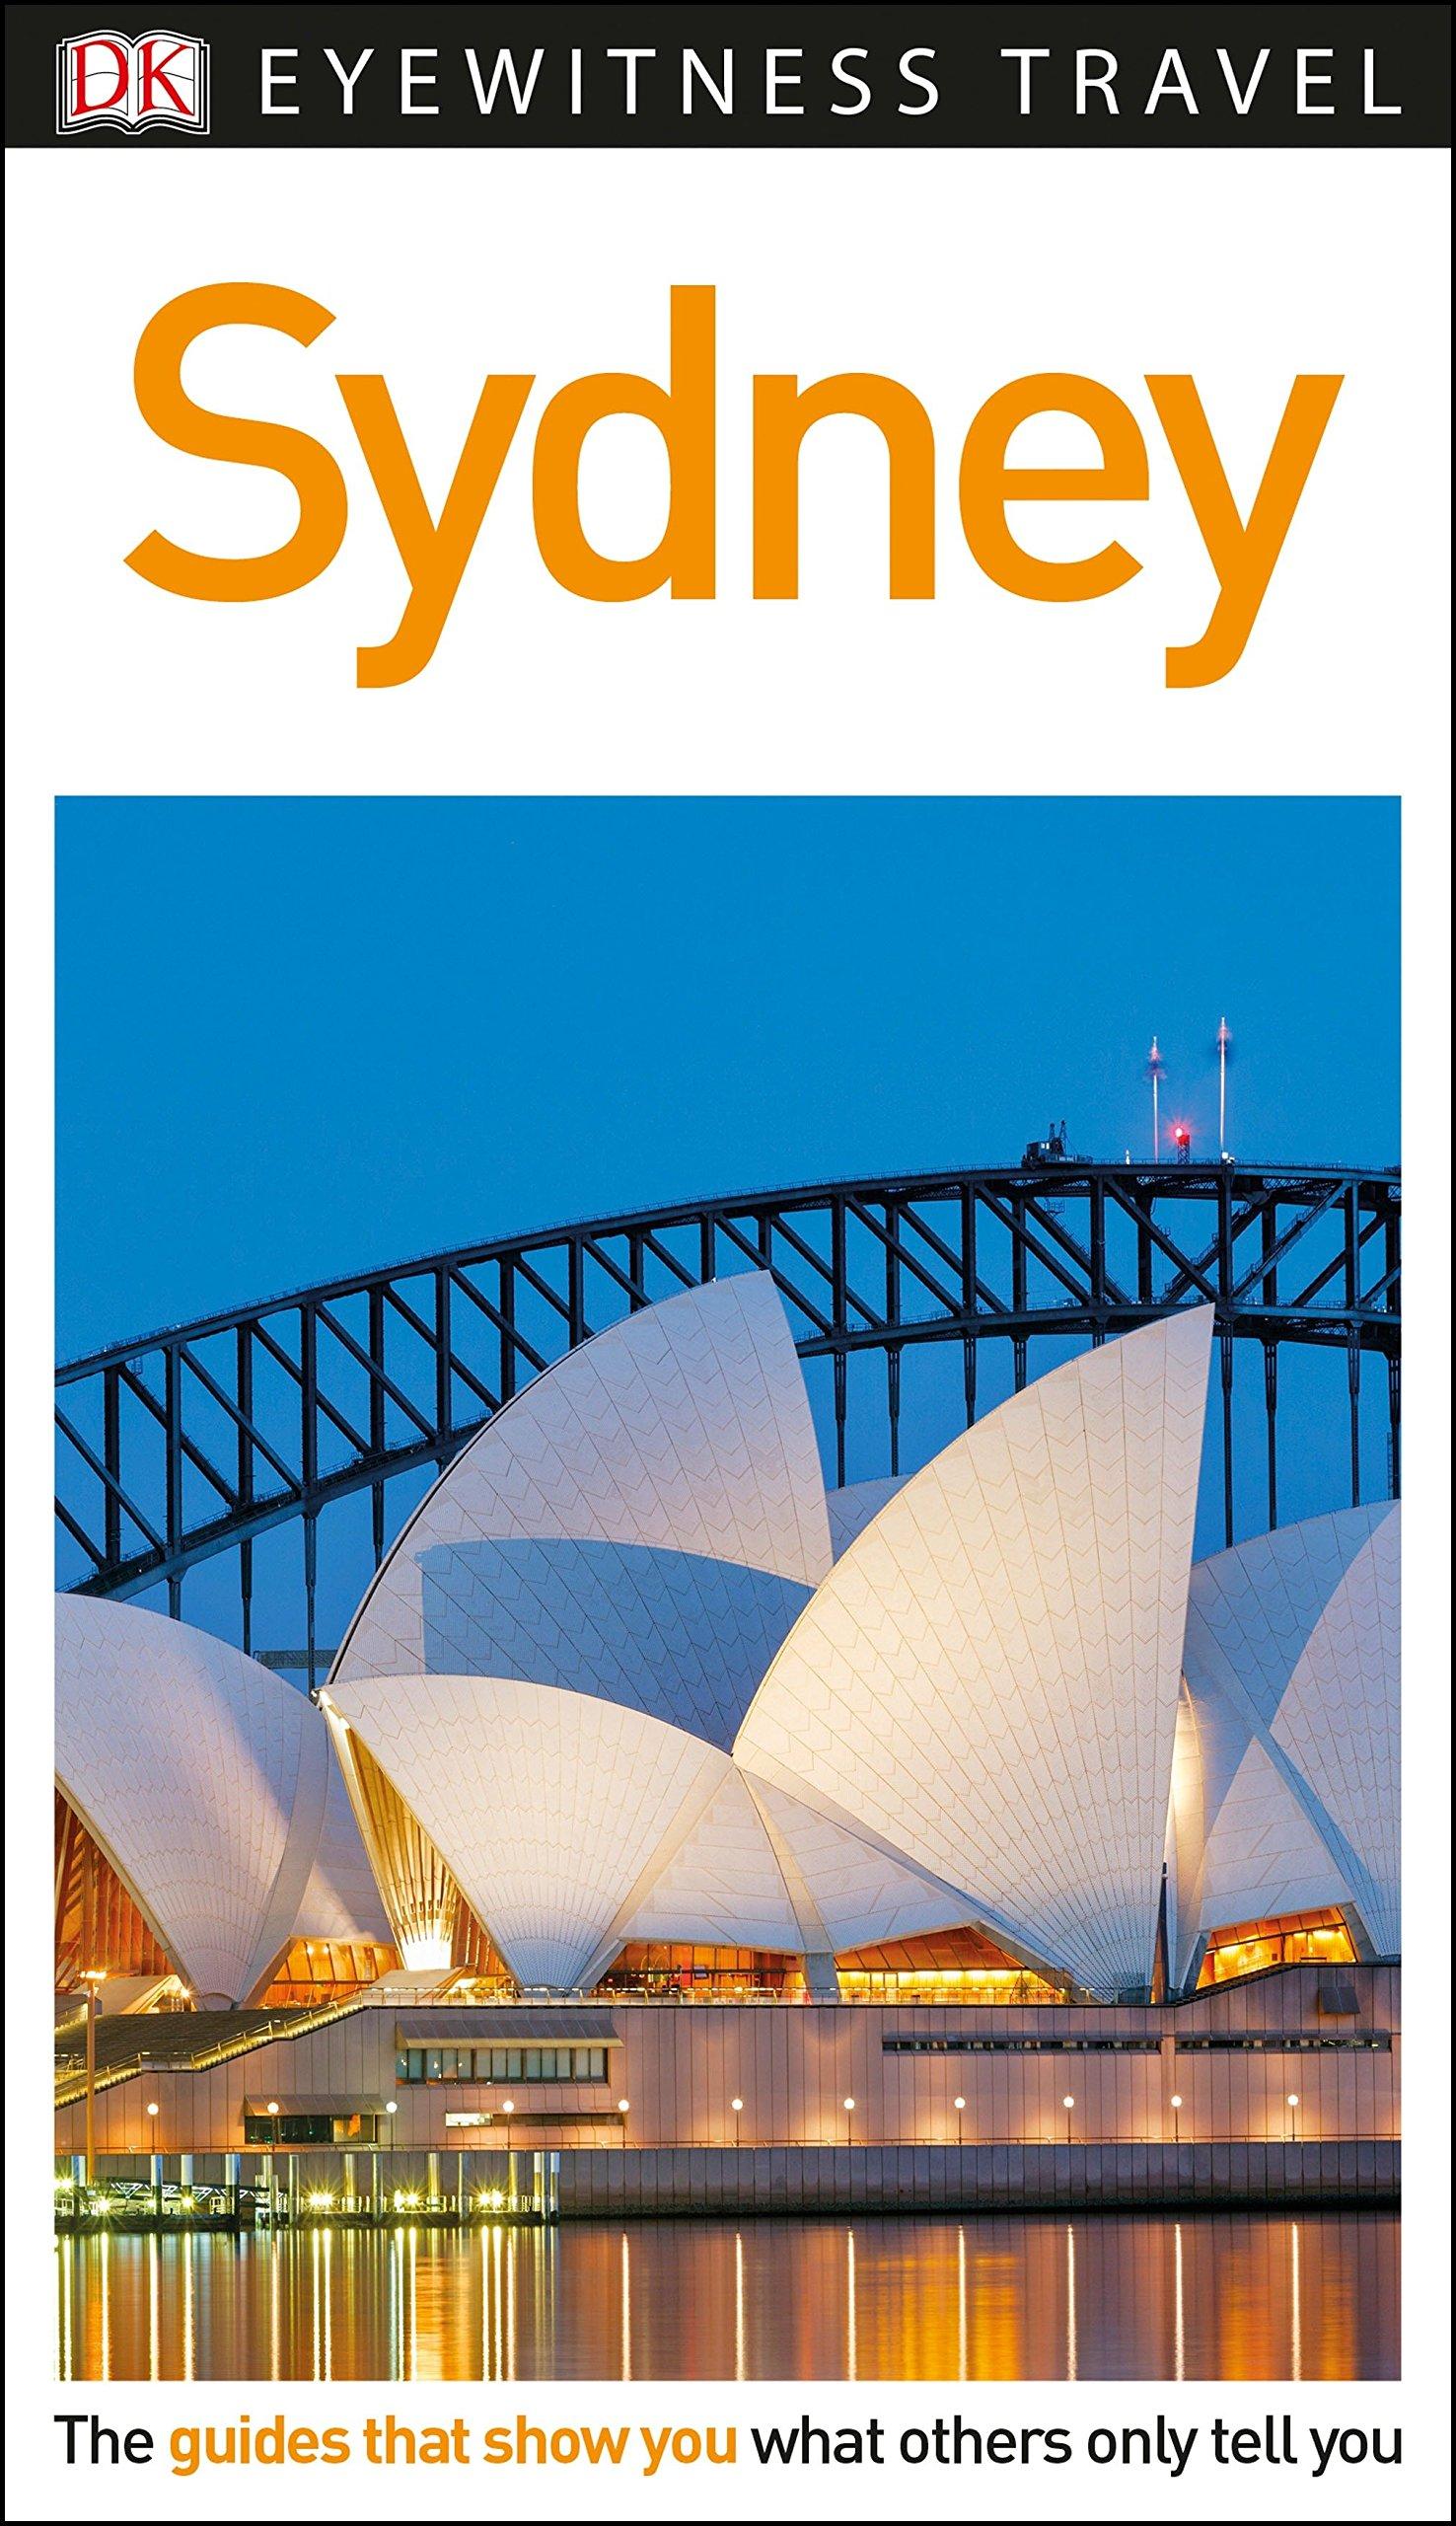 DK Eyewitness Travel Guide Sydney ebook